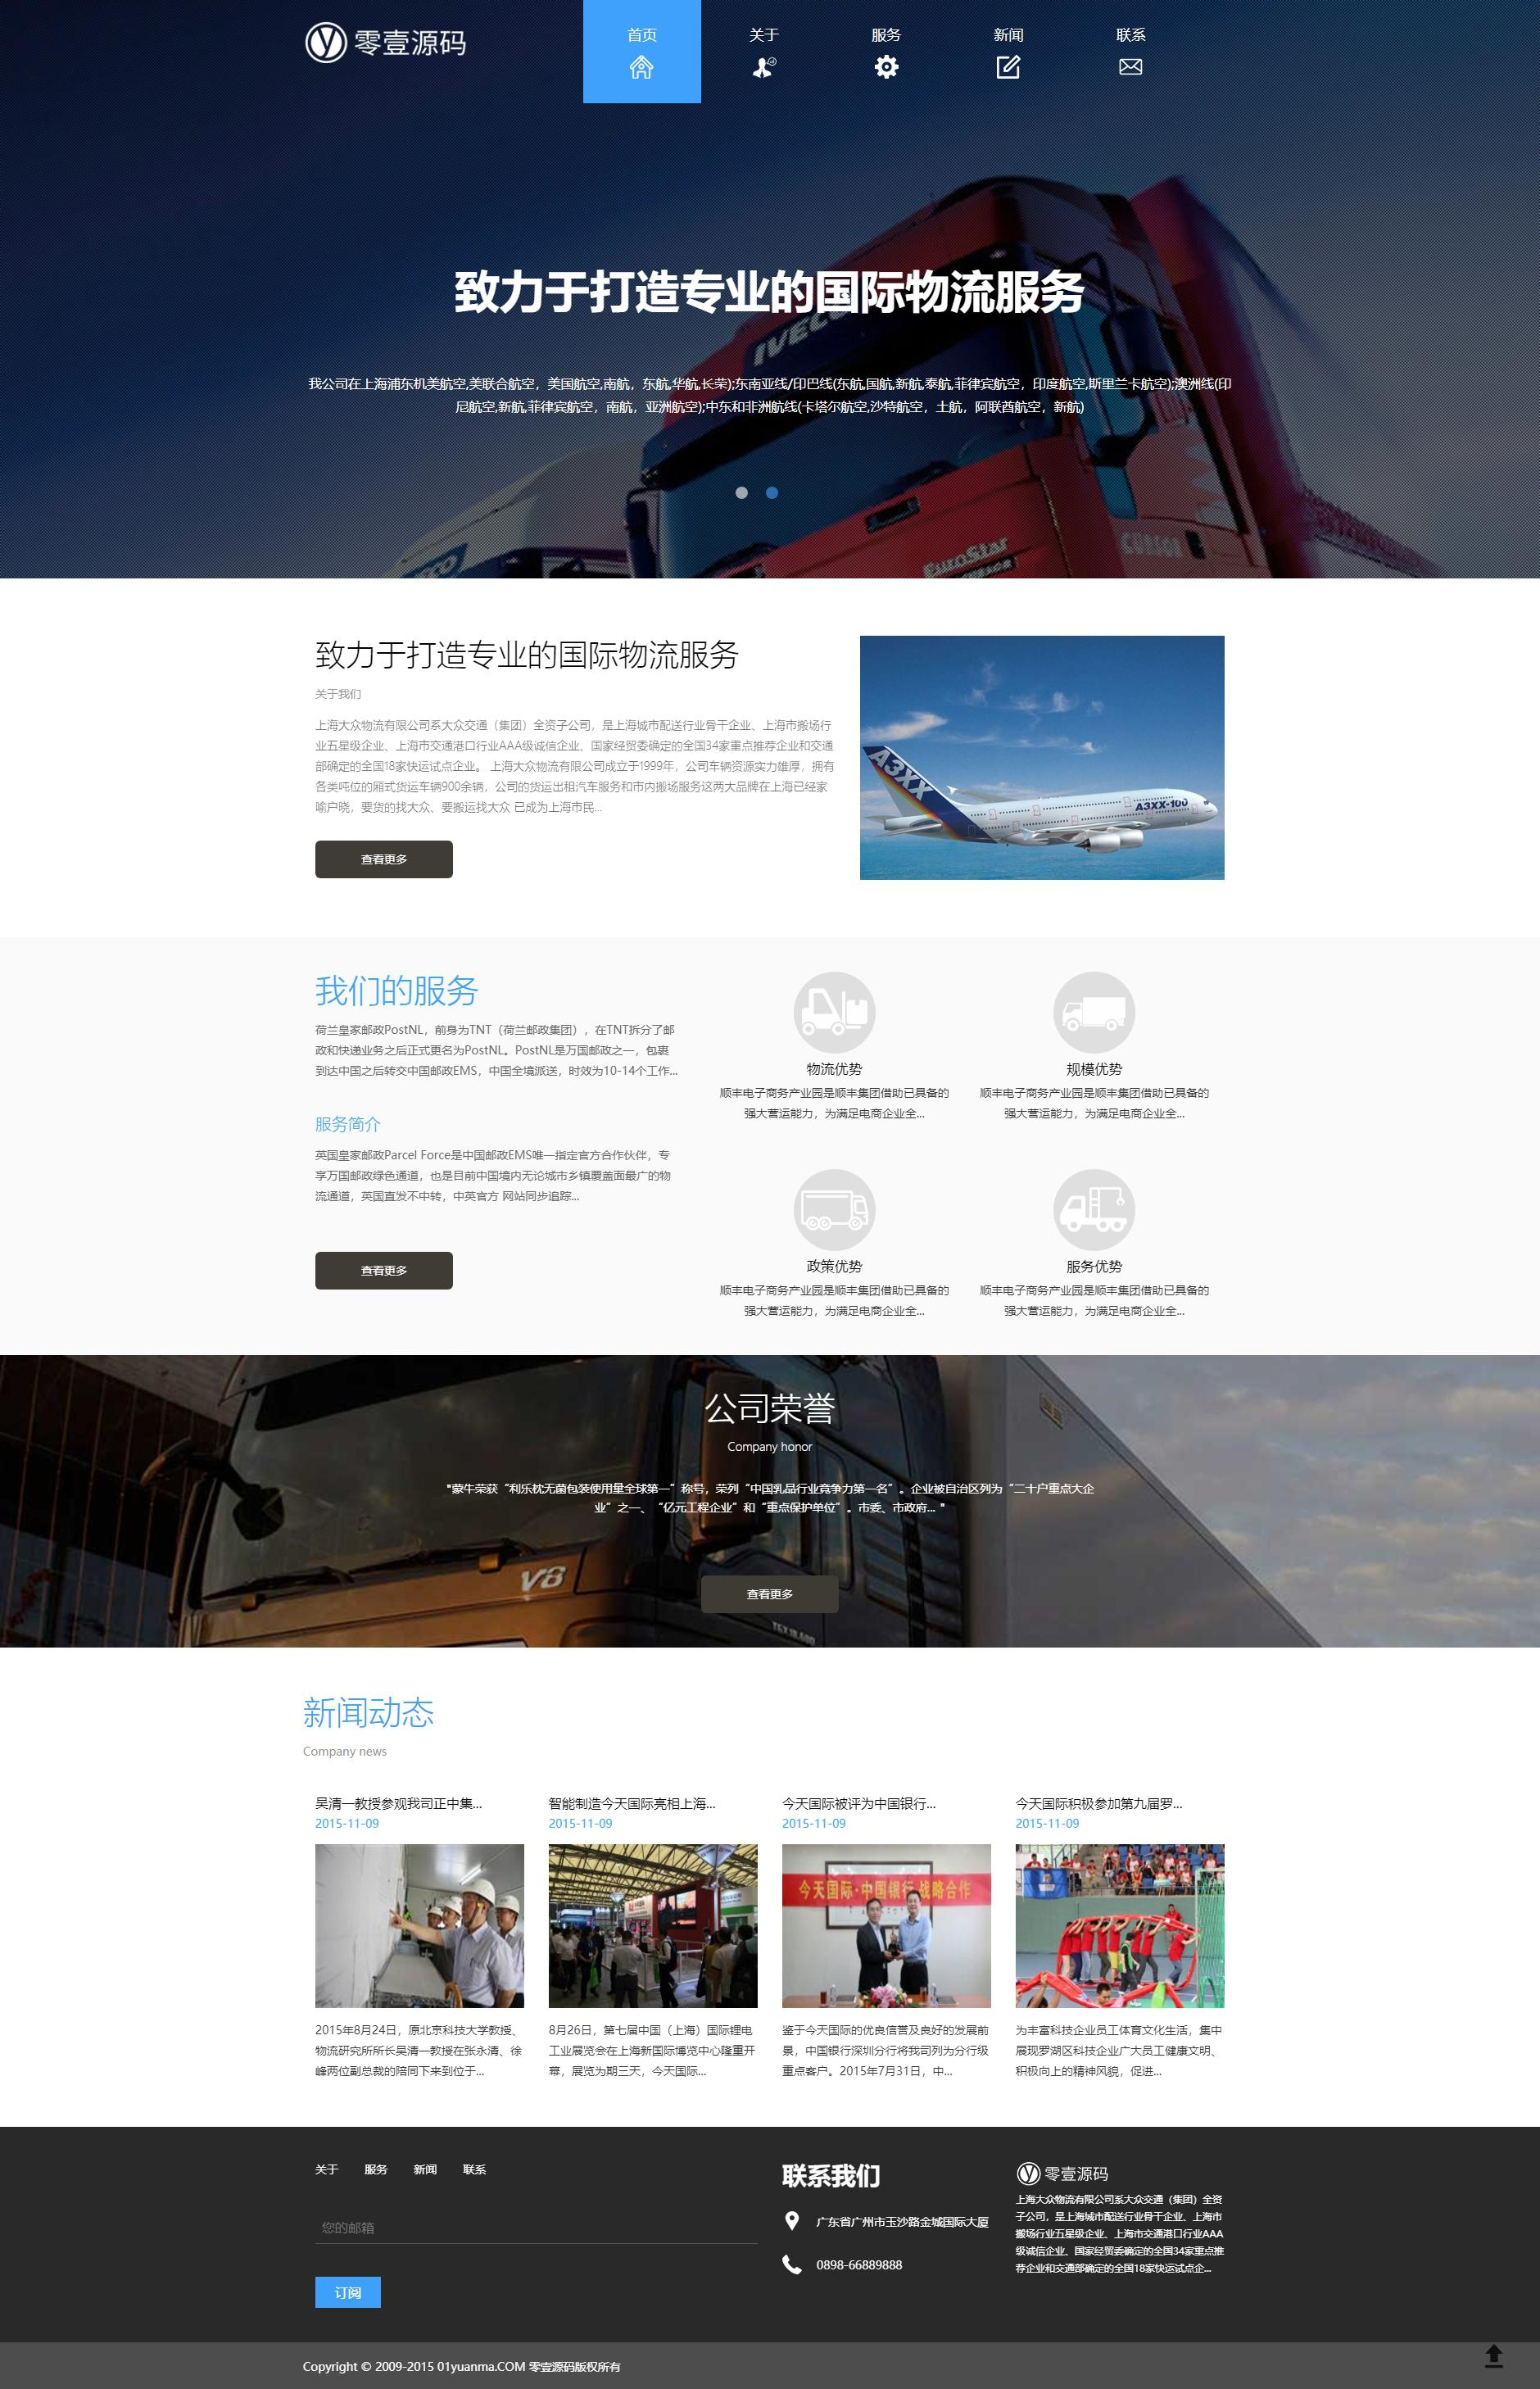 HTML5自适应响应式国际货运物流公司网站织梦dedecms模板